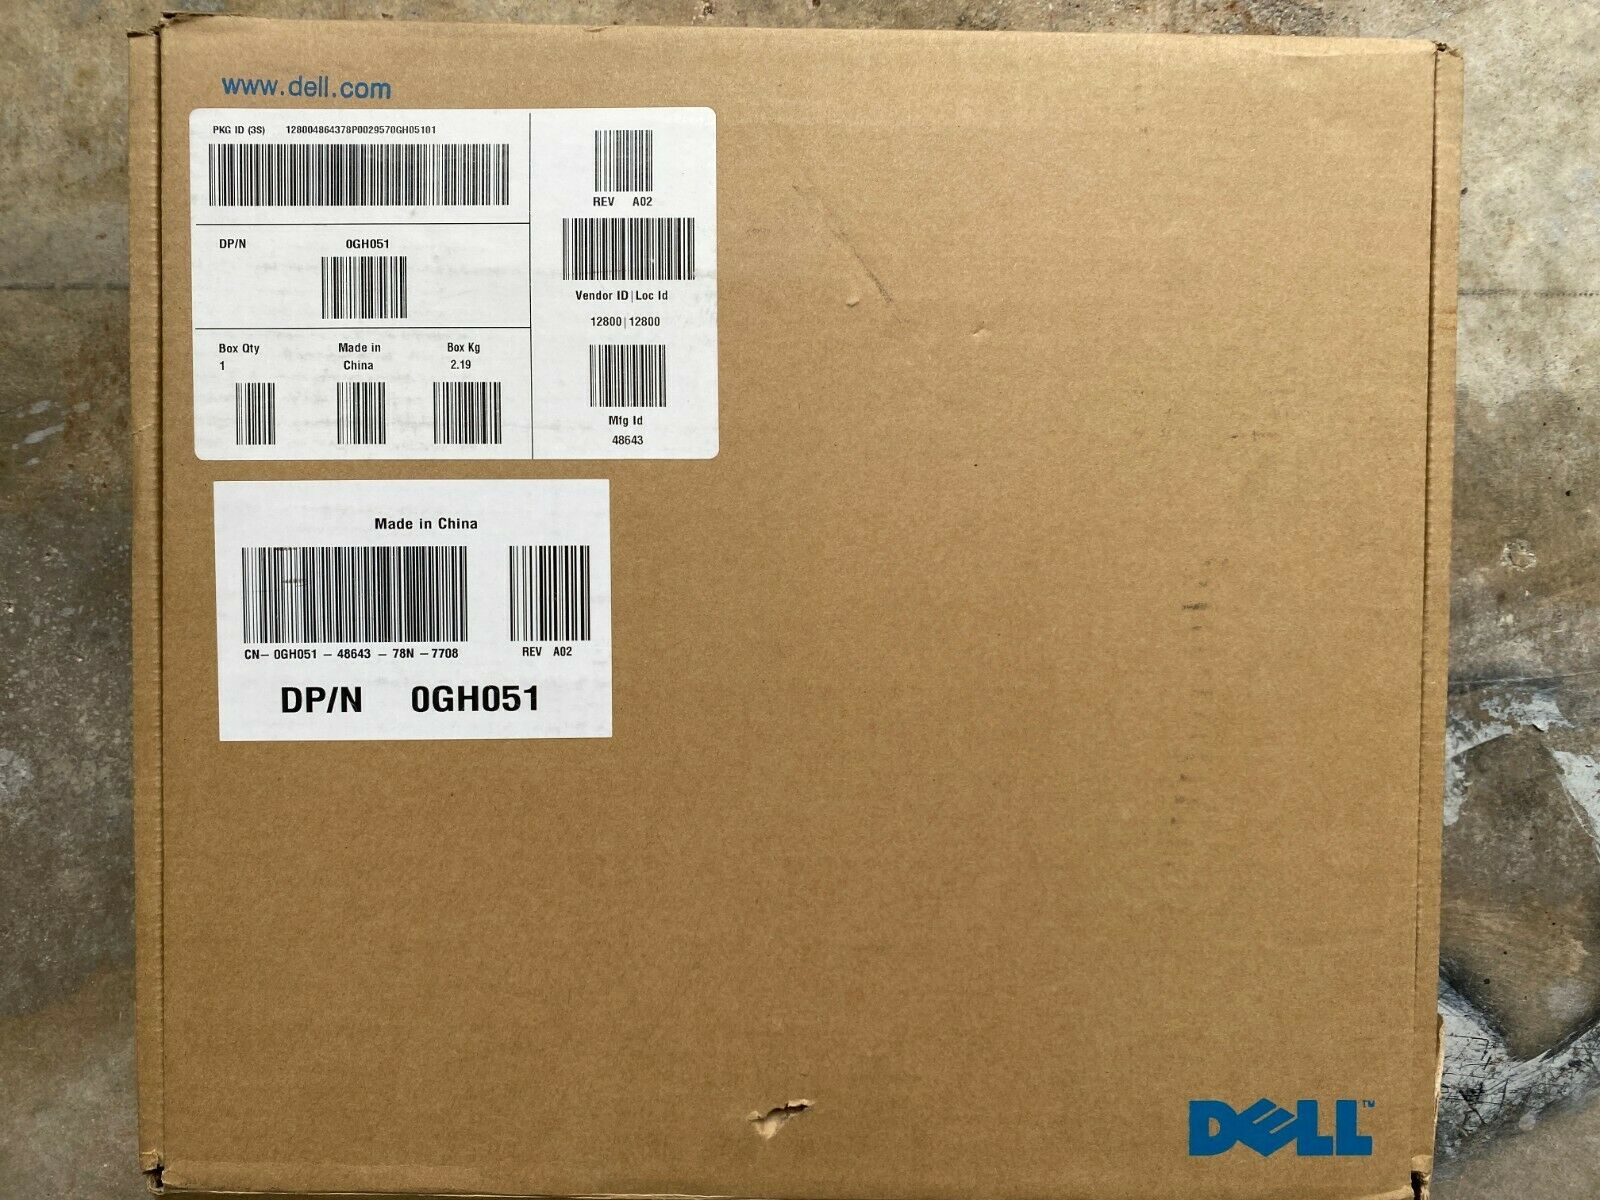 Dell 0GH051 D/Port Advanced Port Replicator Docking Station - NEW In Open Box - $34.99